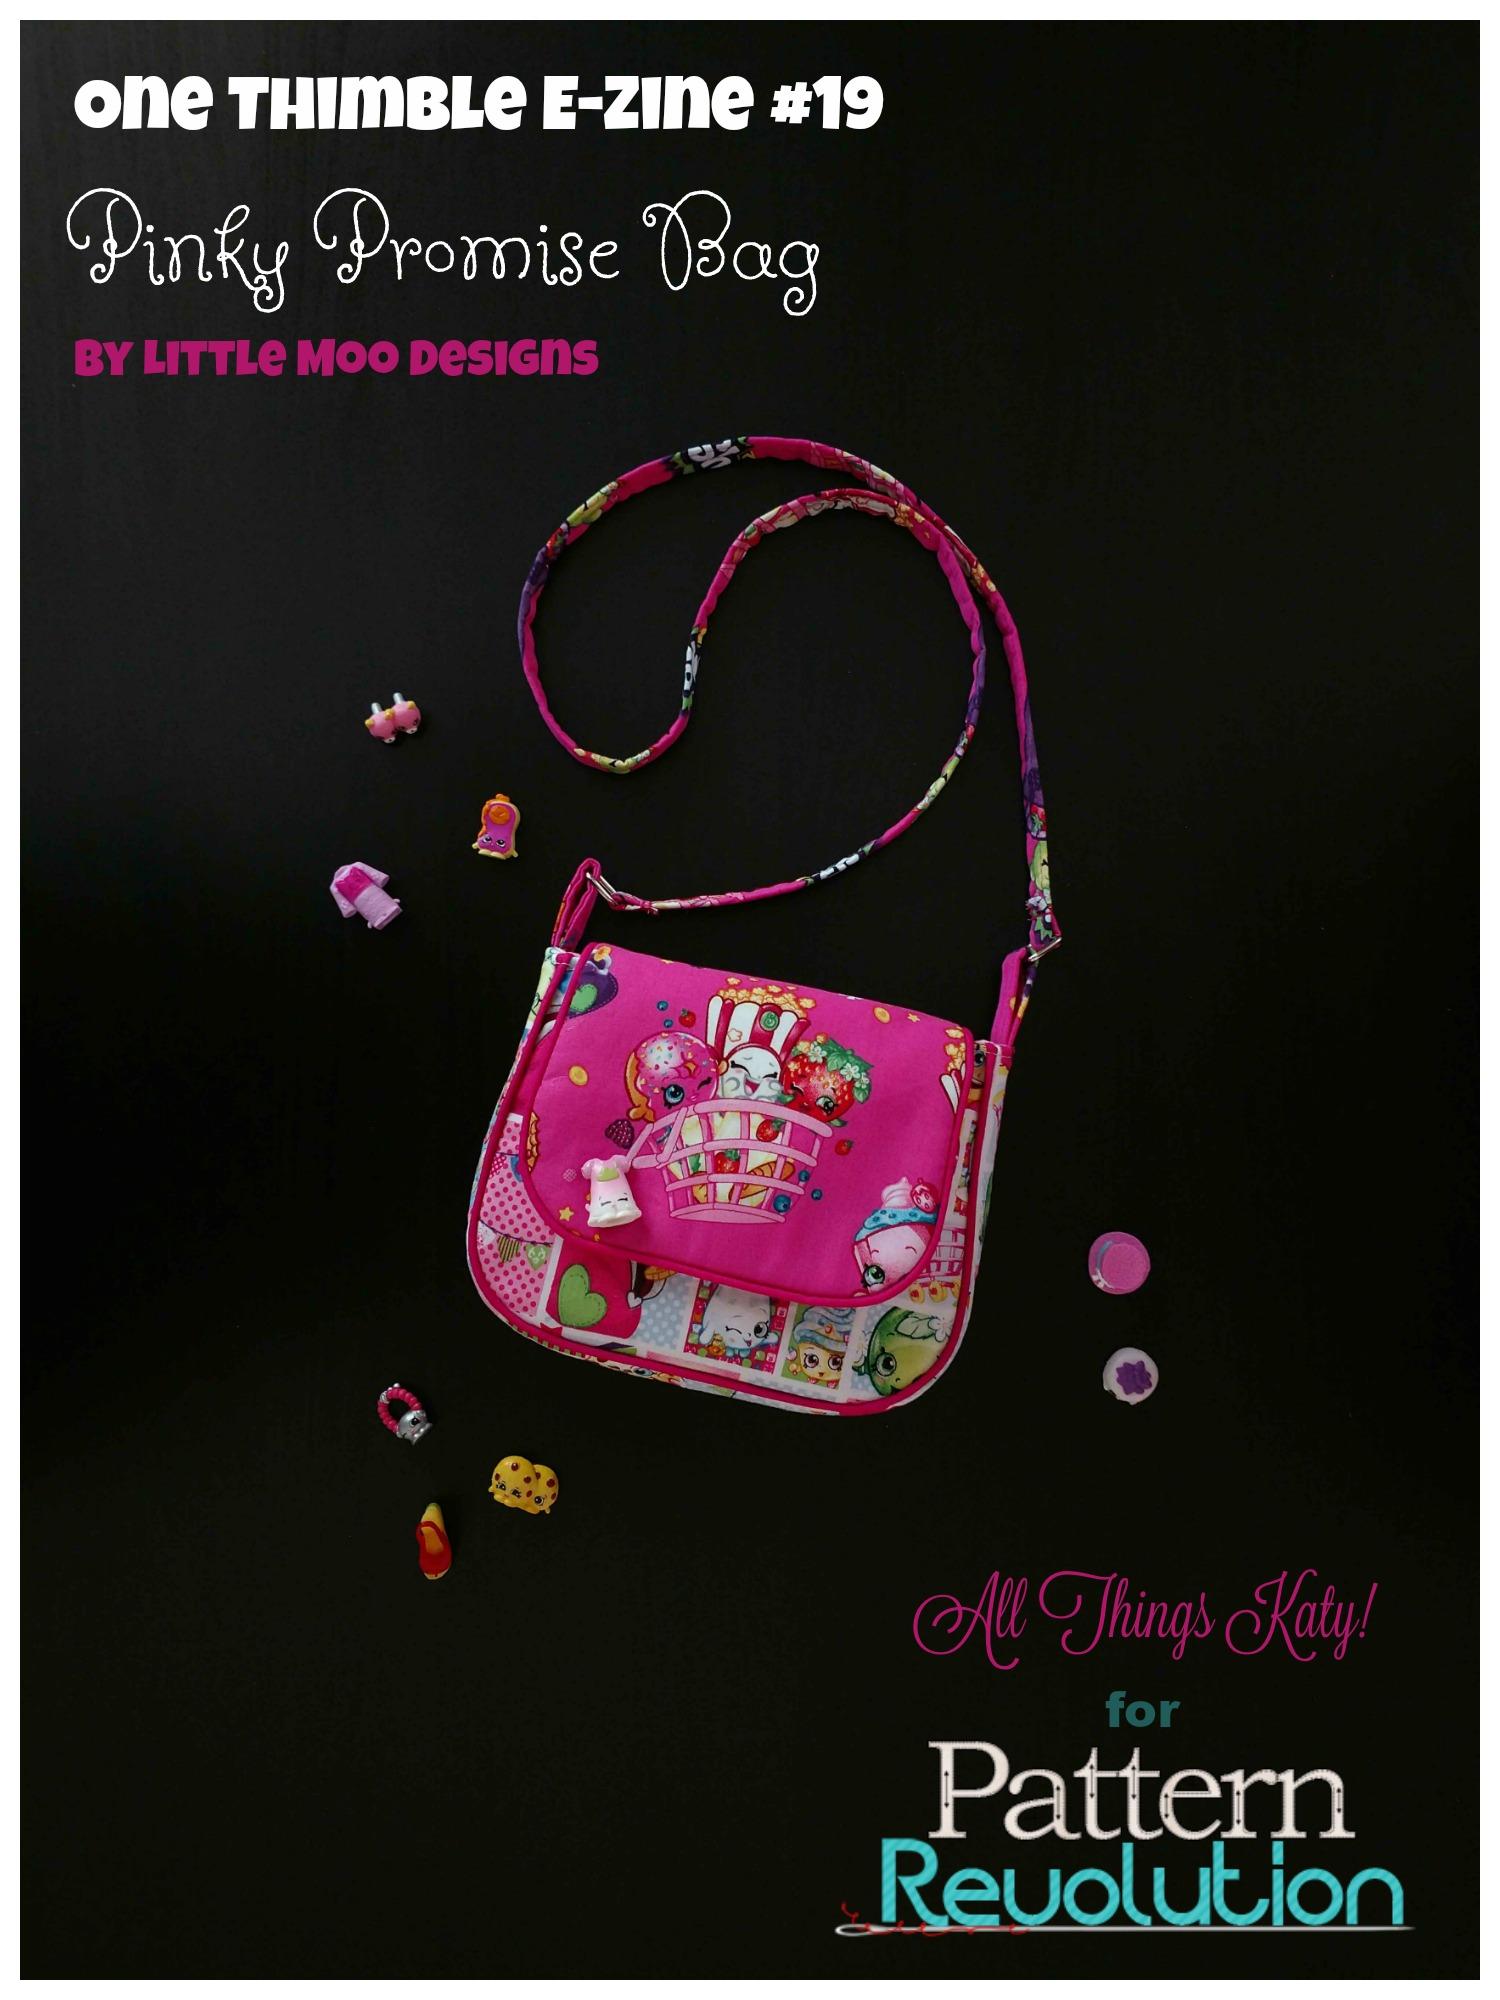 pinky_promise_purse_scatter_pr_wm.jpg